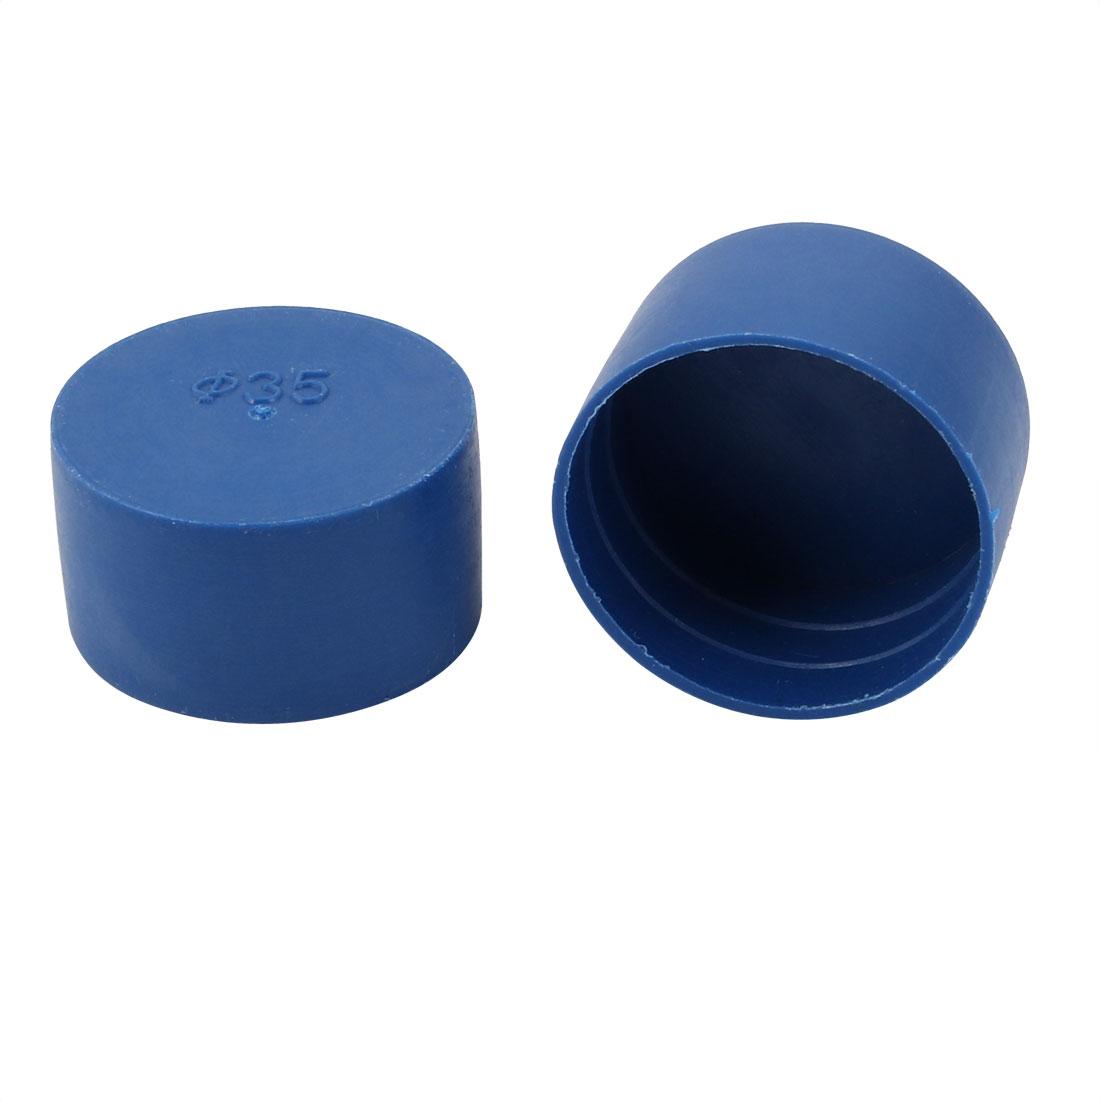 2pcs 35mm Inner Dia PE Plastic End Cap Bolt Thread Protector Tube Cover Blue